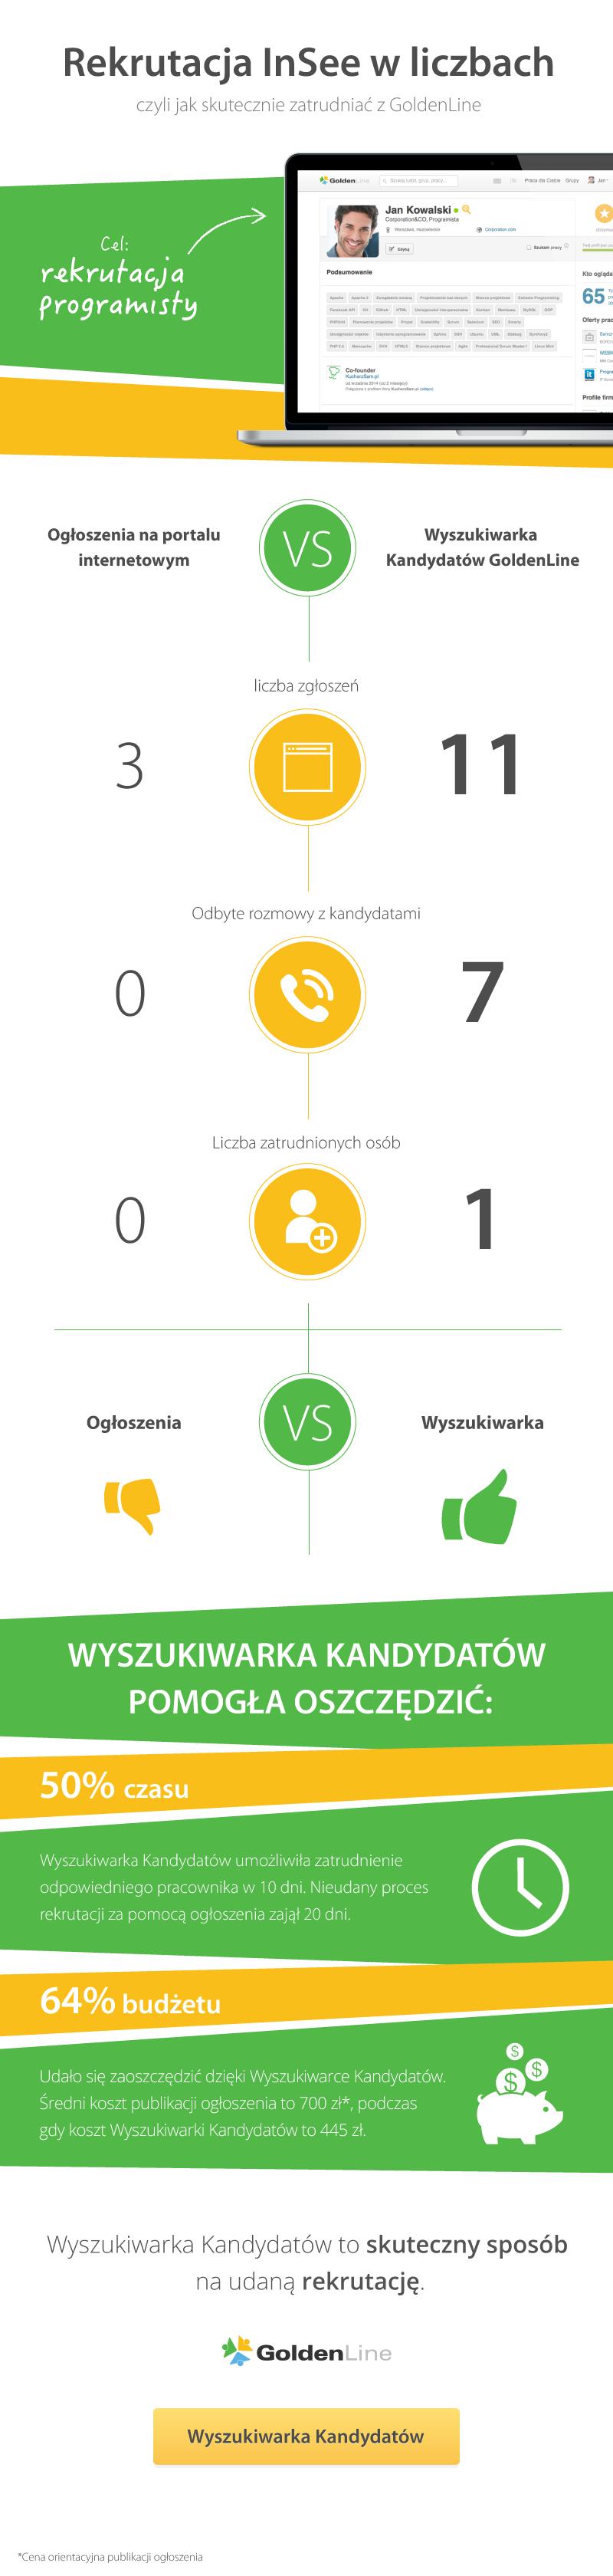 Rekrutacja InSee z GoldenLine - infografika